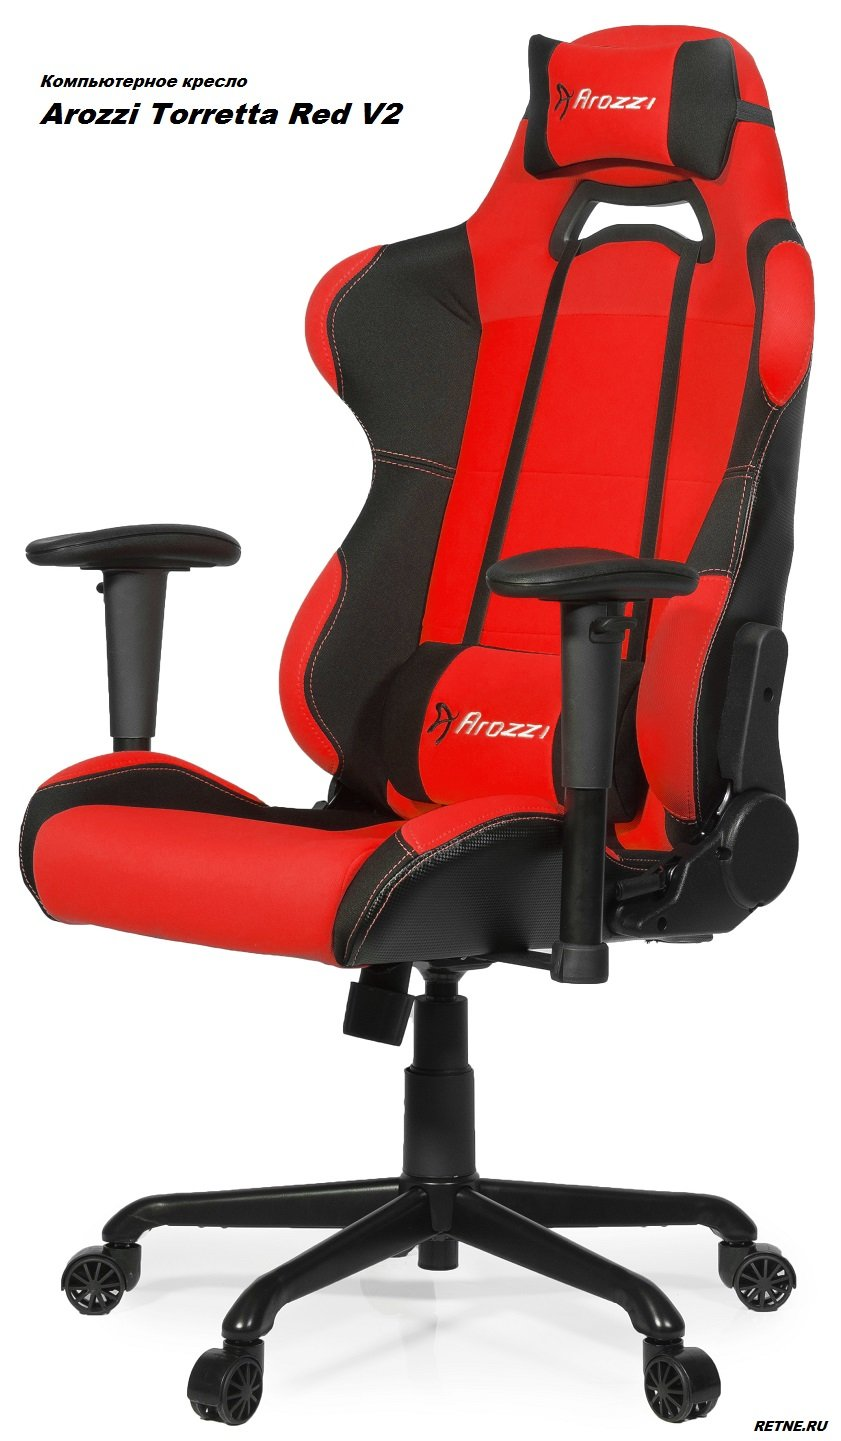 кресла Arozzi-Torretta